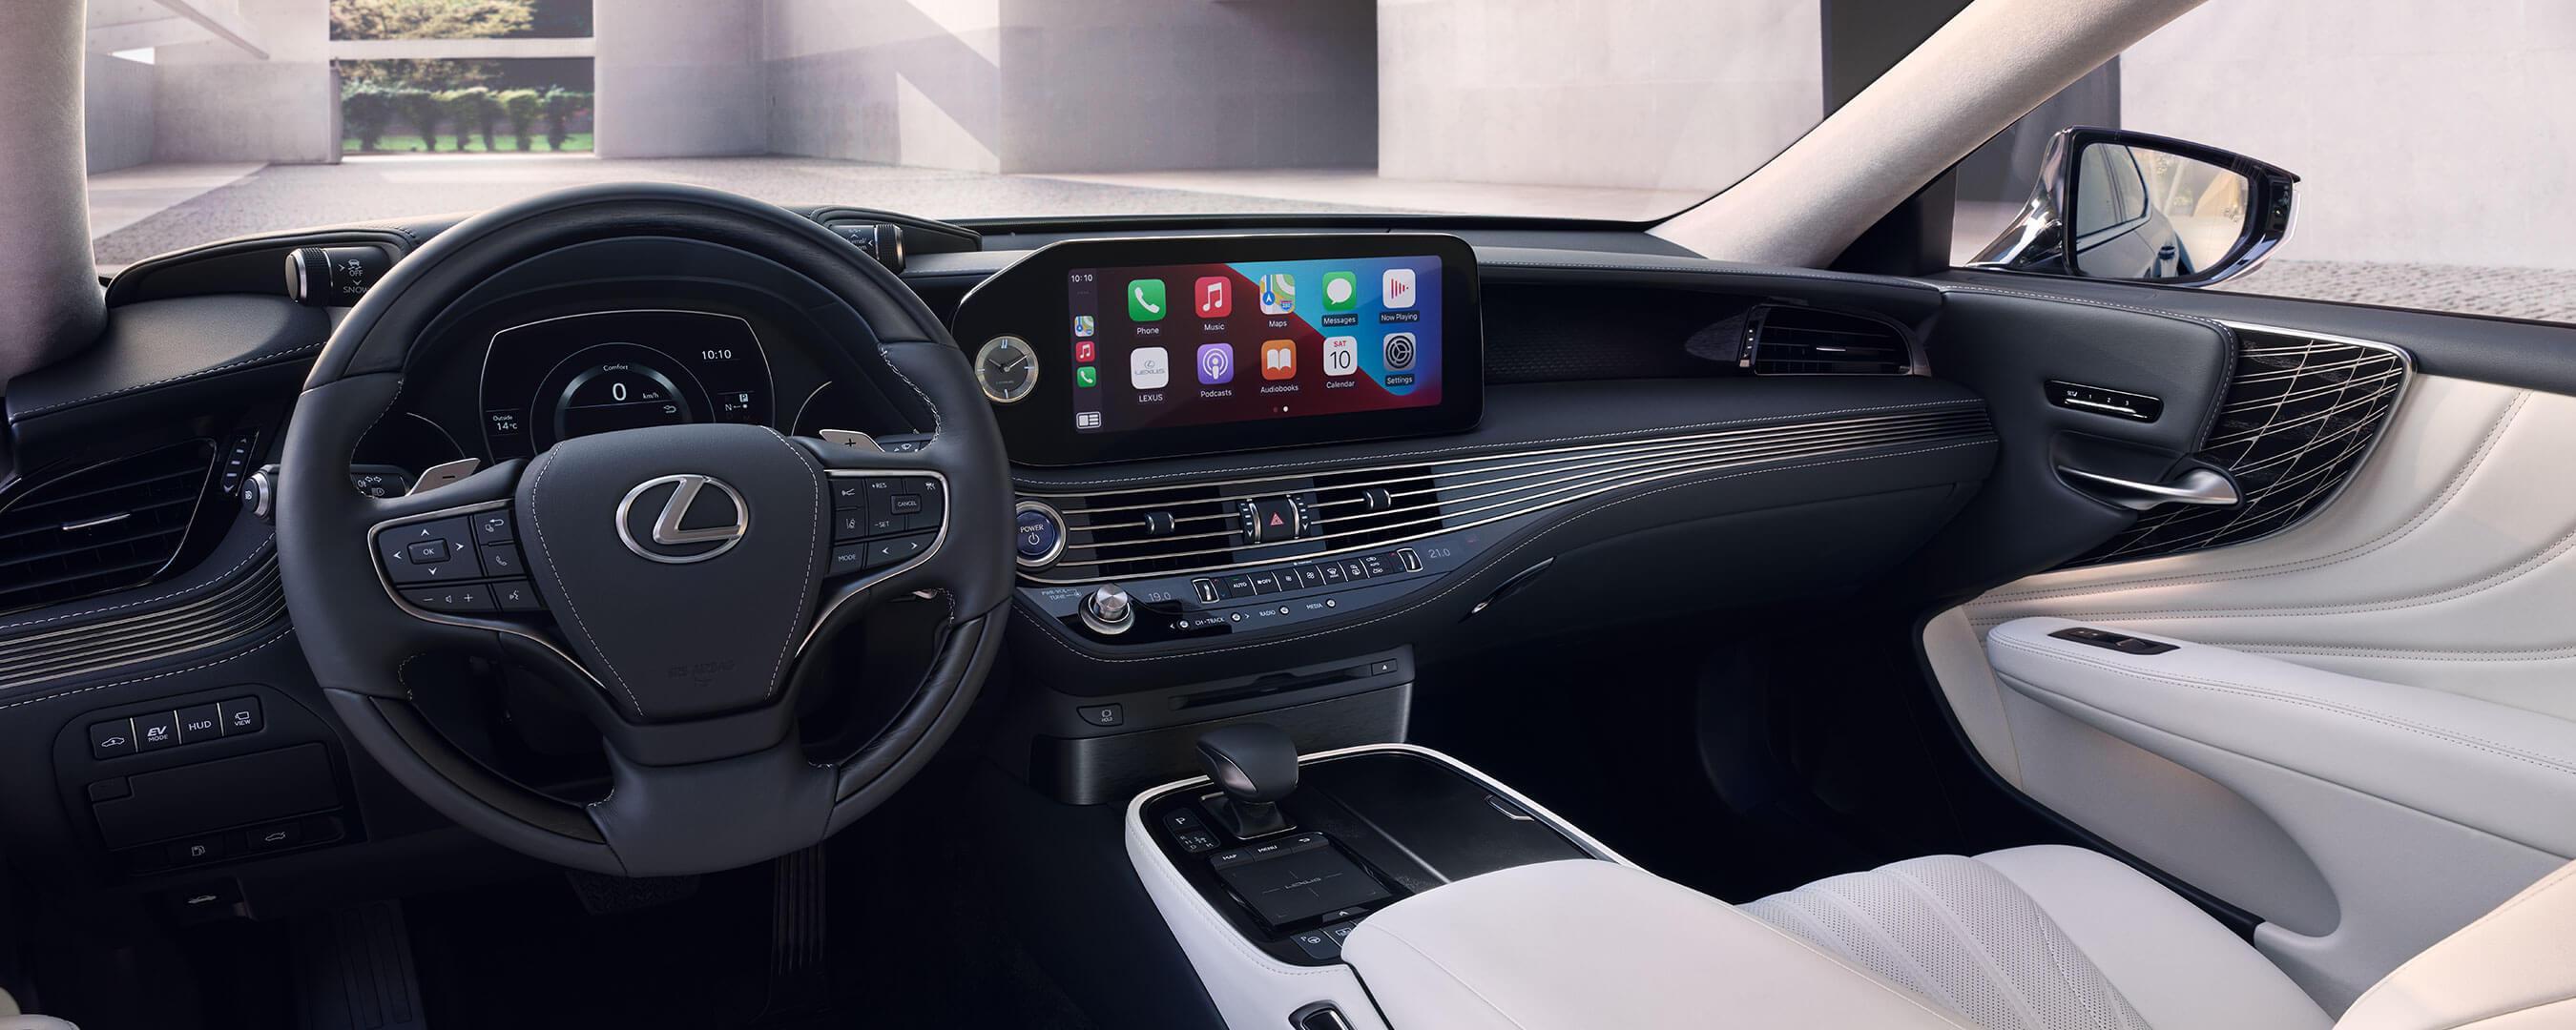 2021 lexus ls experience interior front